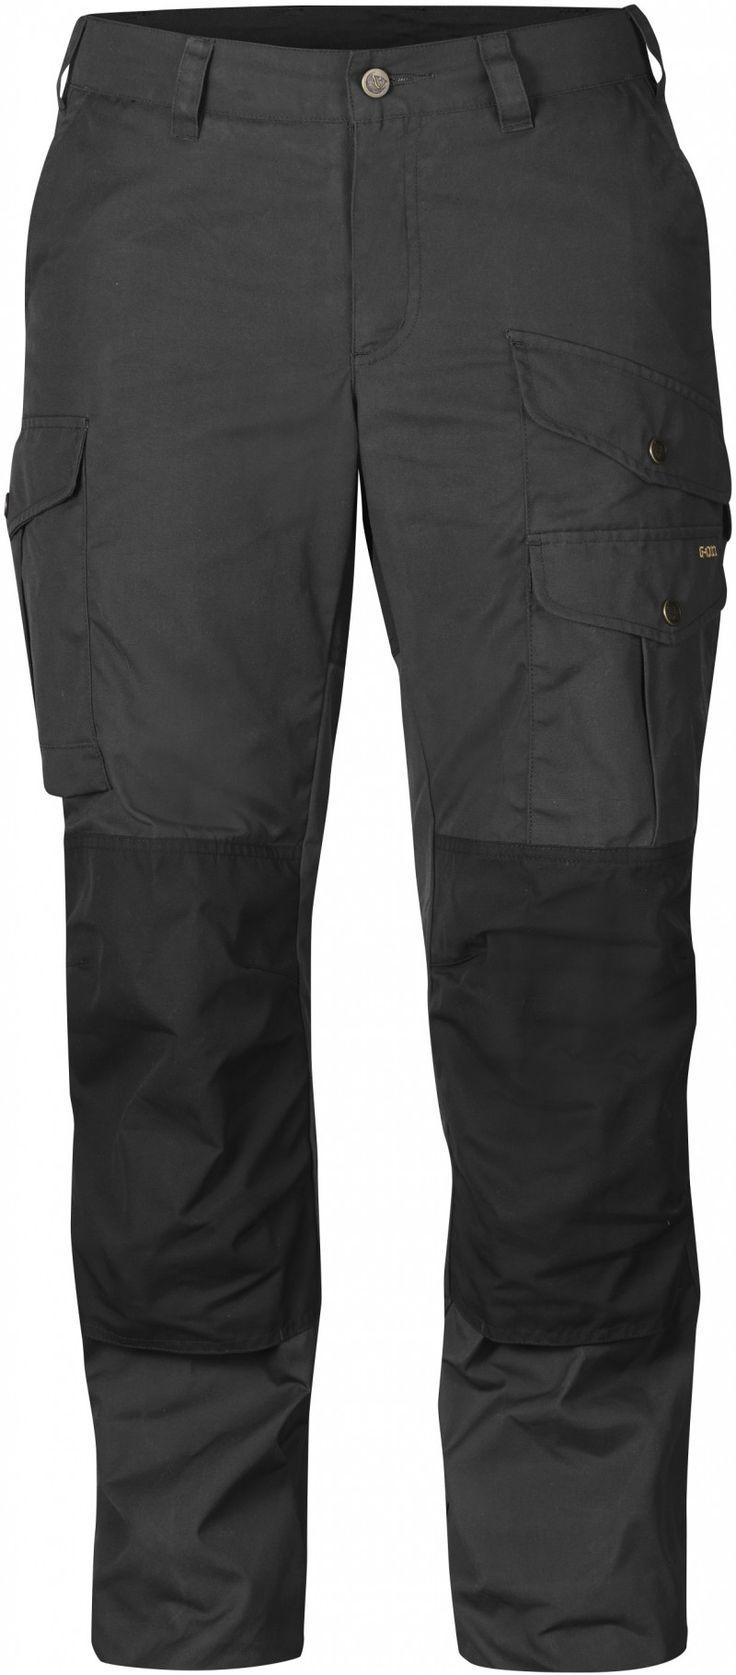 Barents Pro Winter Trousers W. Kr. 1.499,-